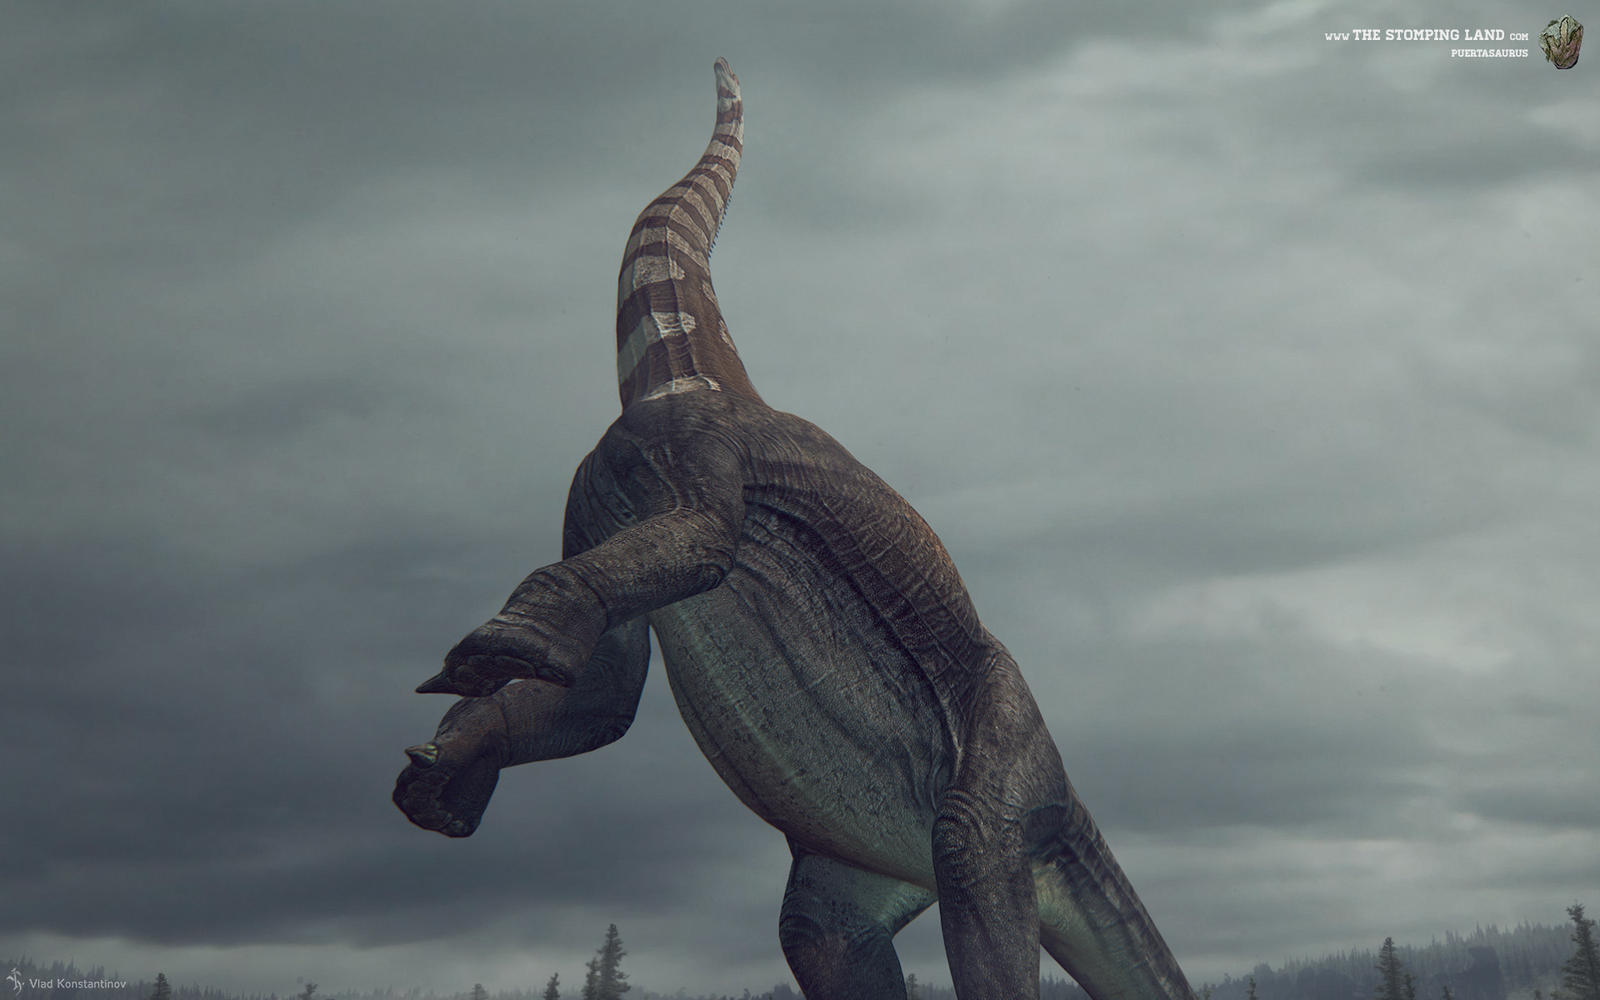 Puertasaurus. The Stomping Land. 01